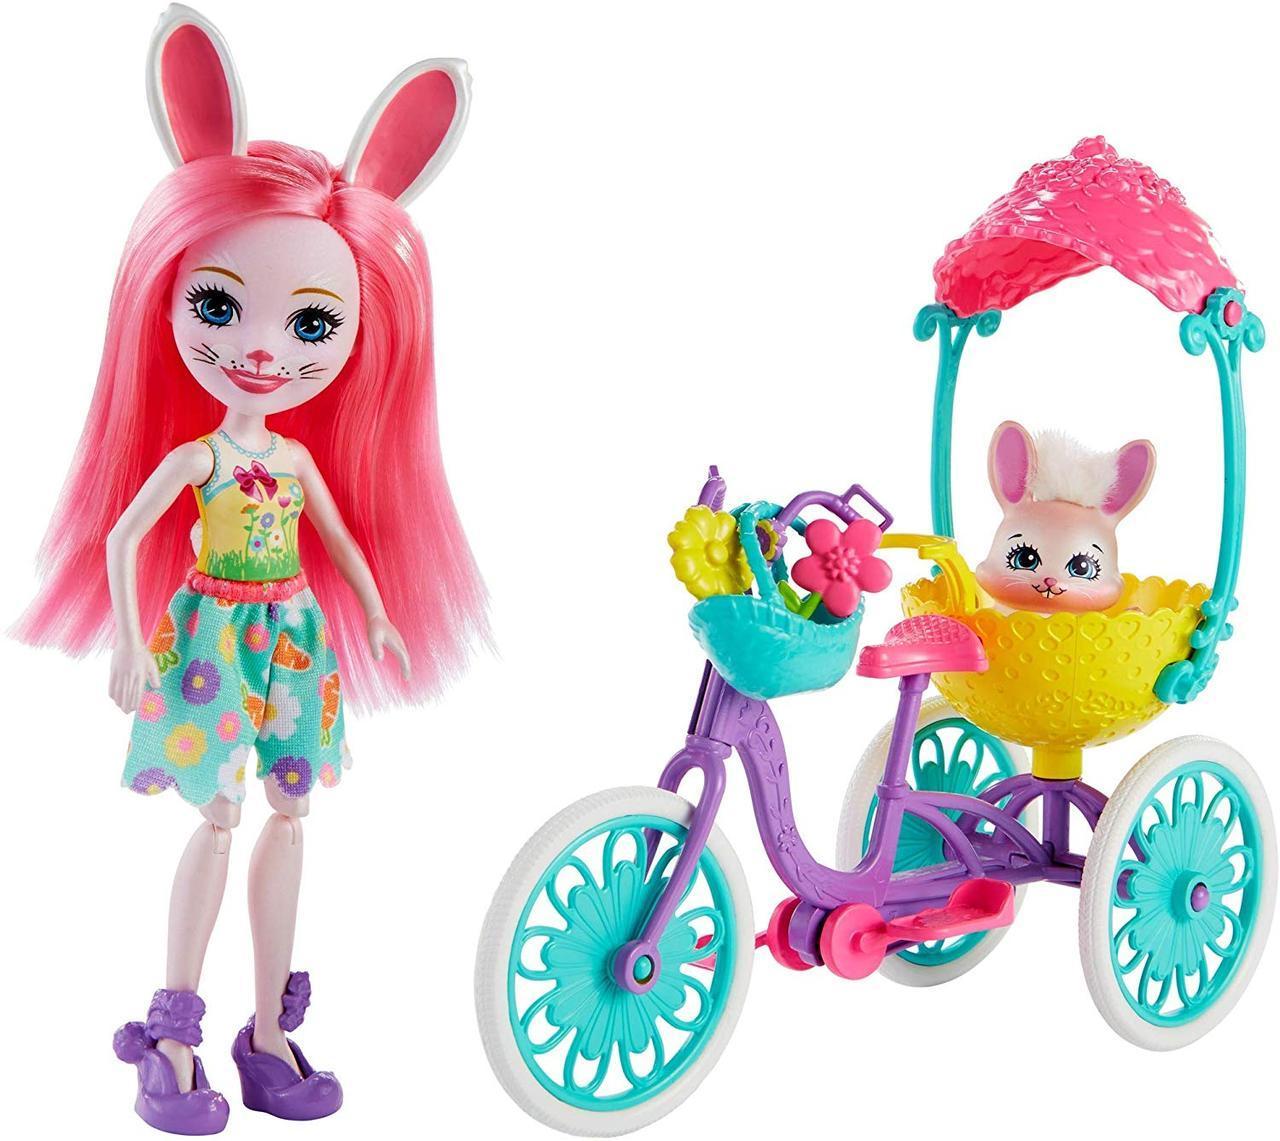 Энчантималс Enchantimals Зайка Бри Банни Прогулка на велосипеде  Pedal Pals Bree Bunny